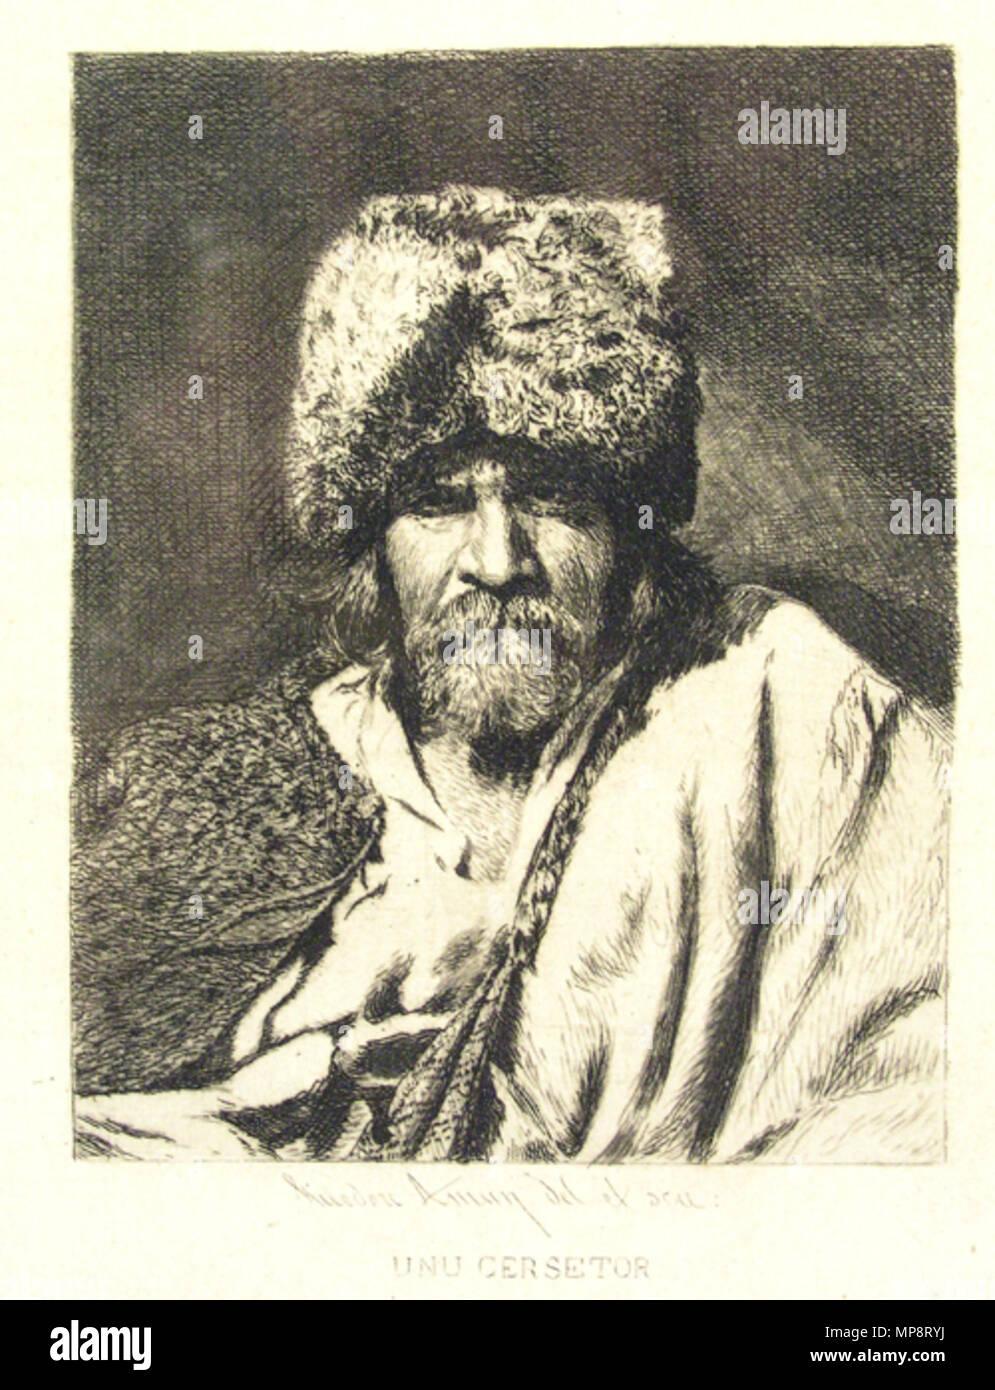 OLYMPUS DIGITALKAMERA. Englisch: Theodor Aman - Bettler, unter dem ...